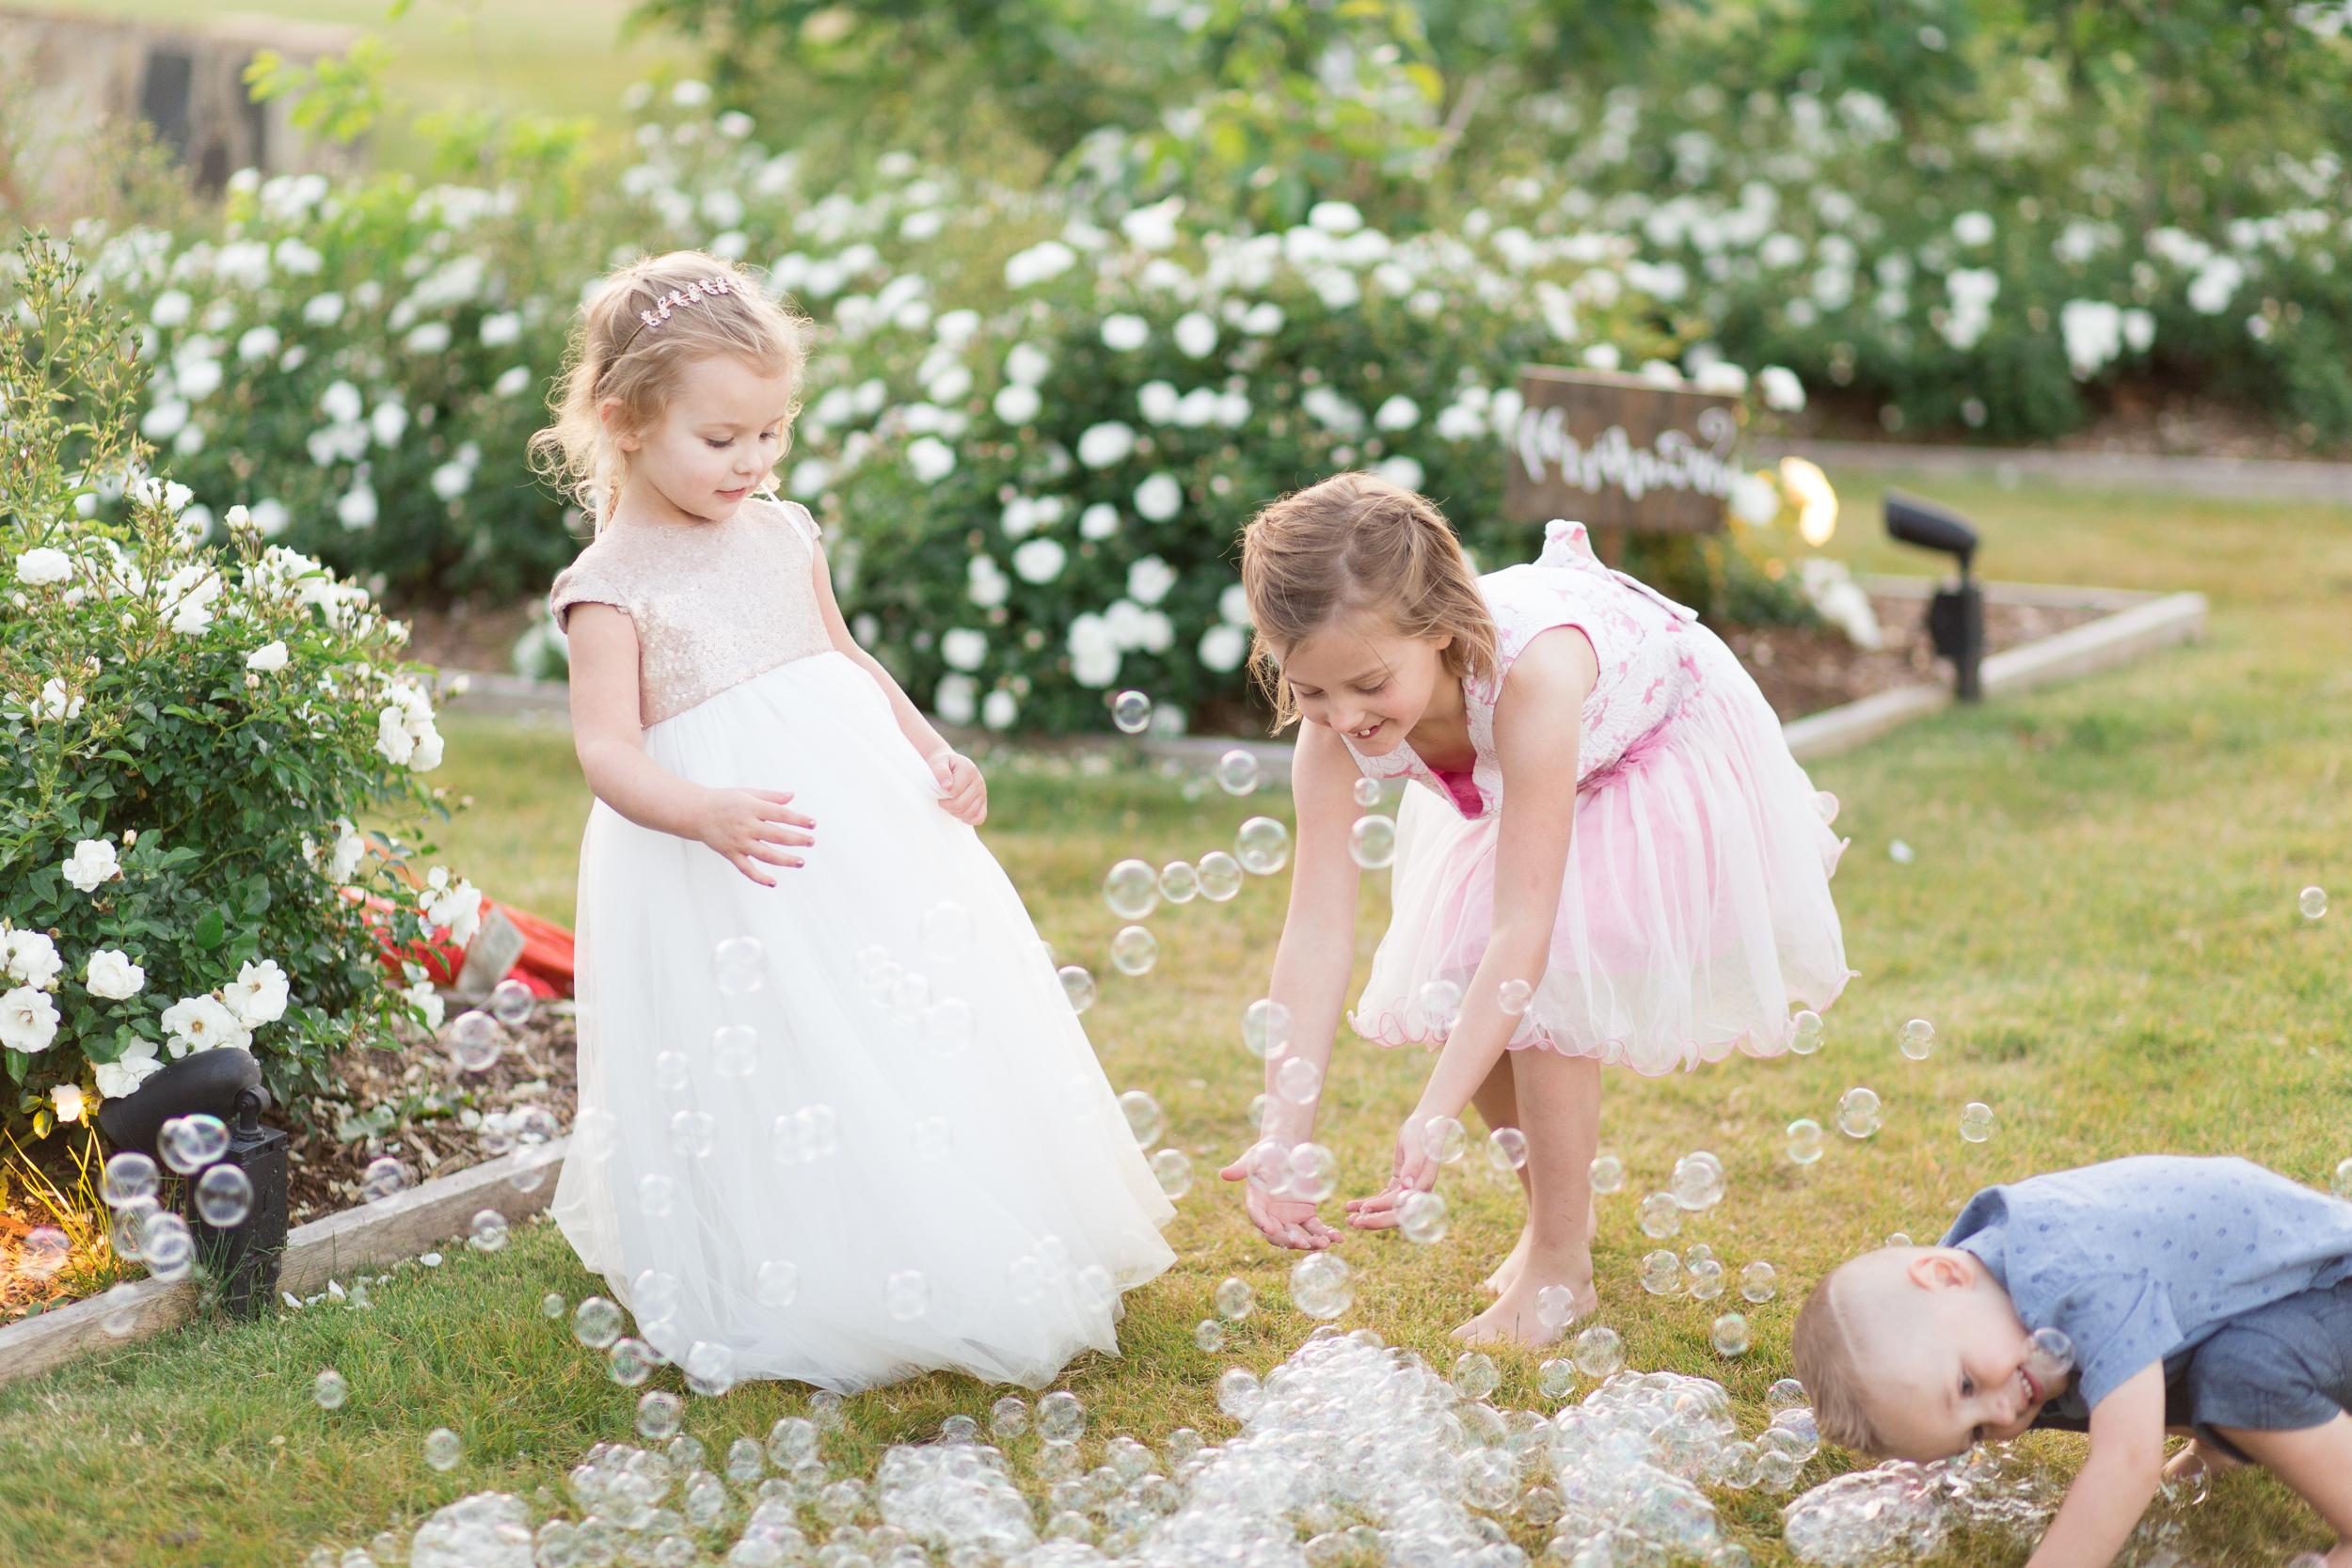 Zihlman-East TX Wedding_Kelsie Hendricks Photography_The Folmar Tyler Texas-129.jpg